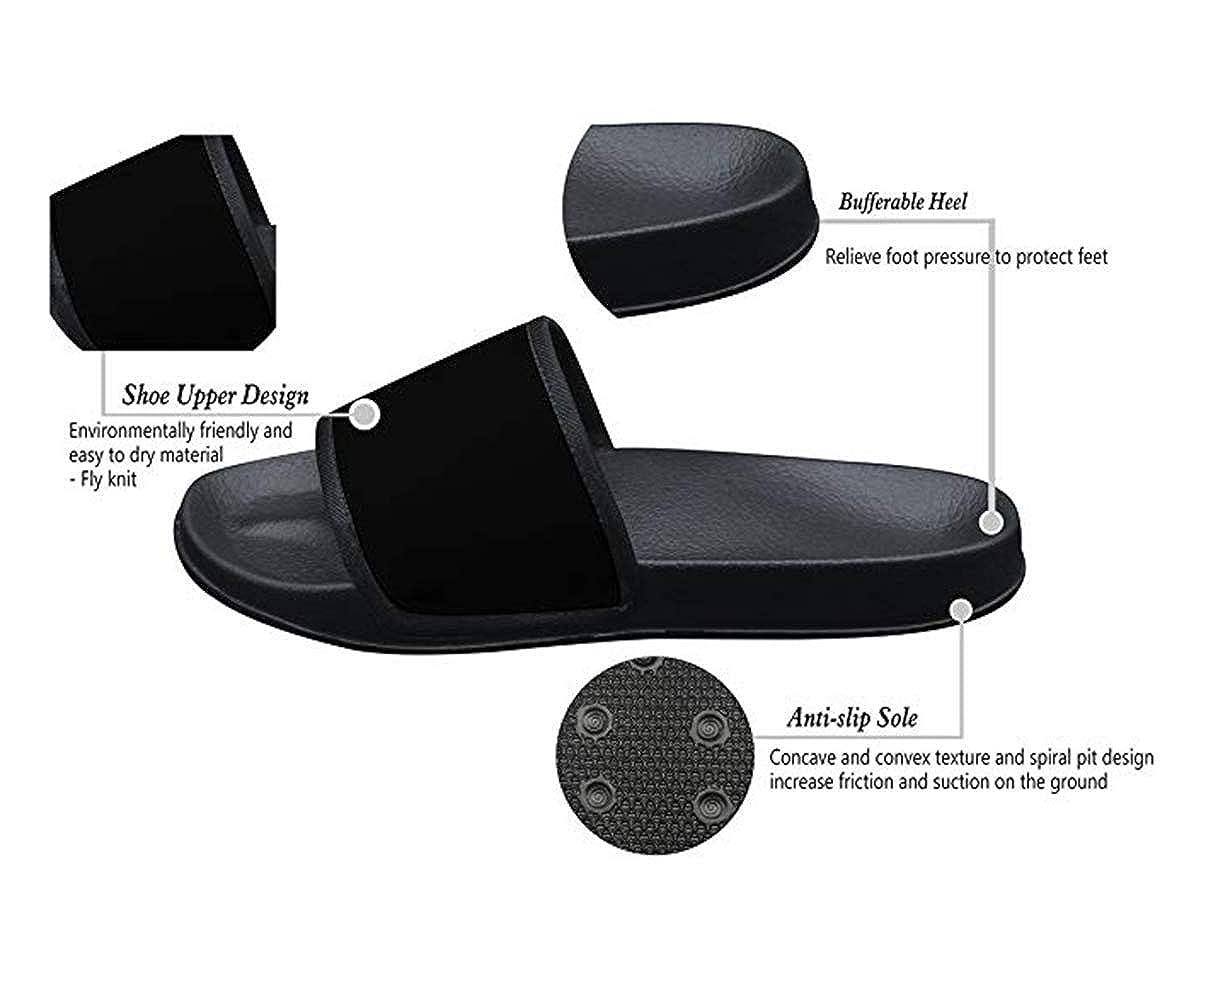 Unisex Sandals Pink Strawberry Fly Knit Anti-Slip Kids Slippers for Sneakerboy Girls Black Flip Flops